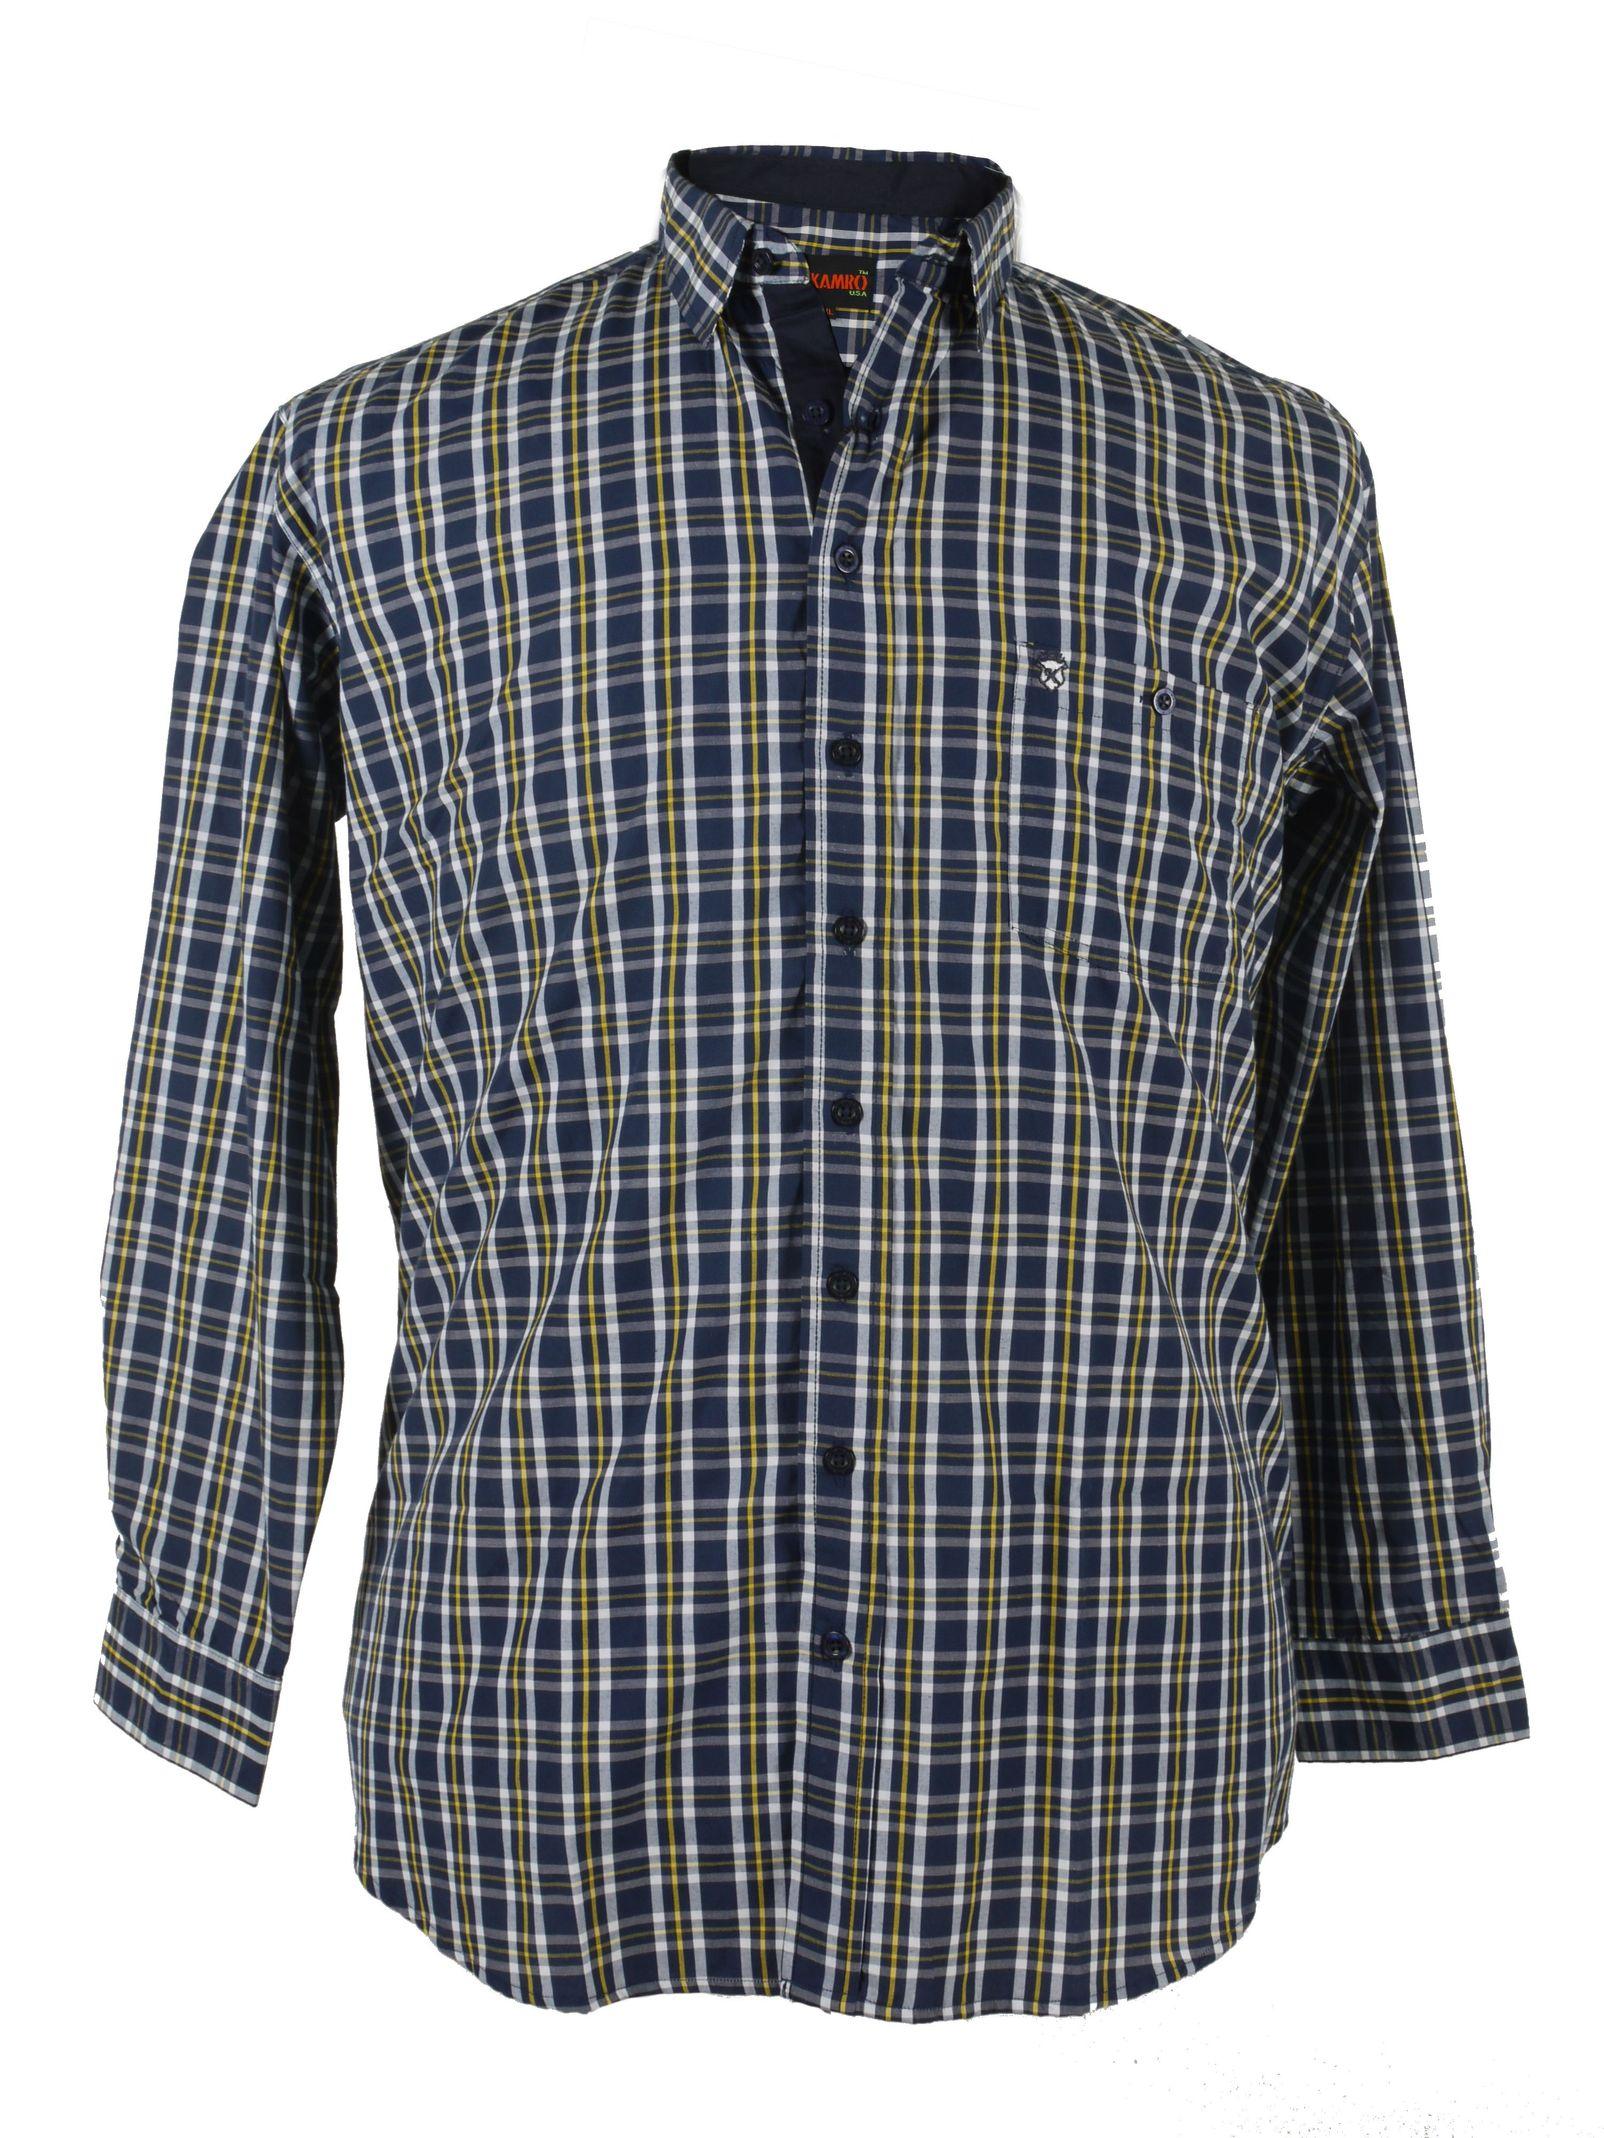 buy online ab7a3 9f9ab Blau/gelb kariertes Langarmhemd von Kamro